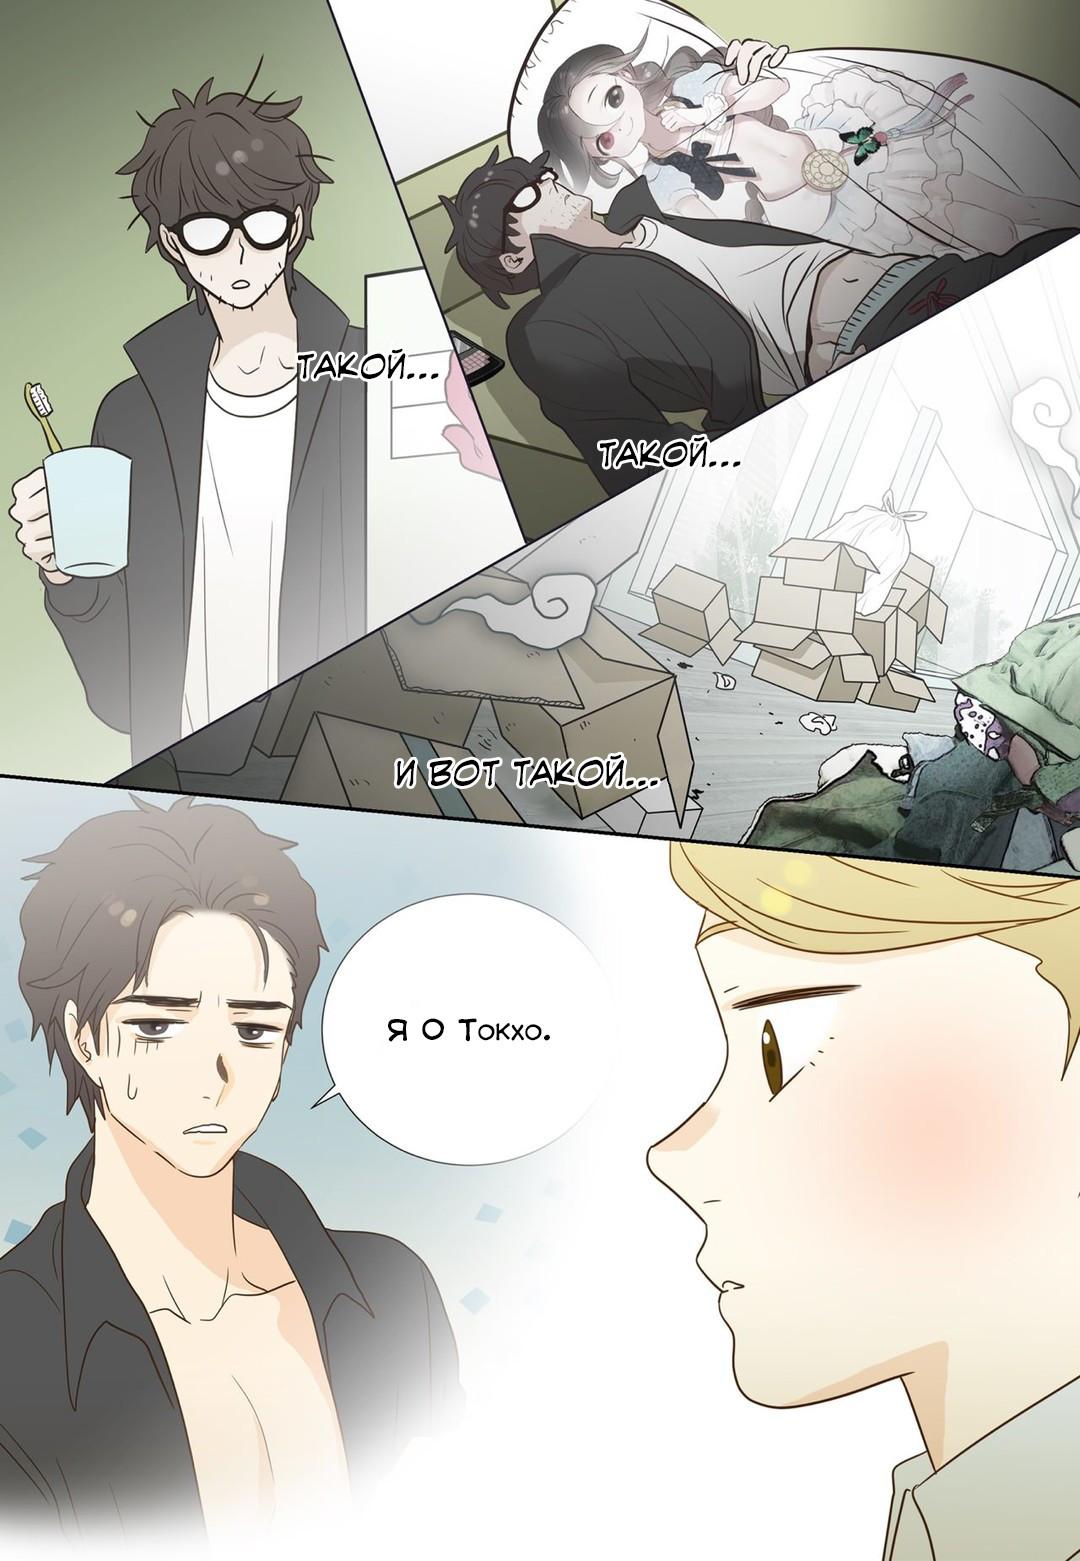 https://r1.ninemanga.com/comics/pic3/46/33774/1279571/1542876496590.jpg Page 5